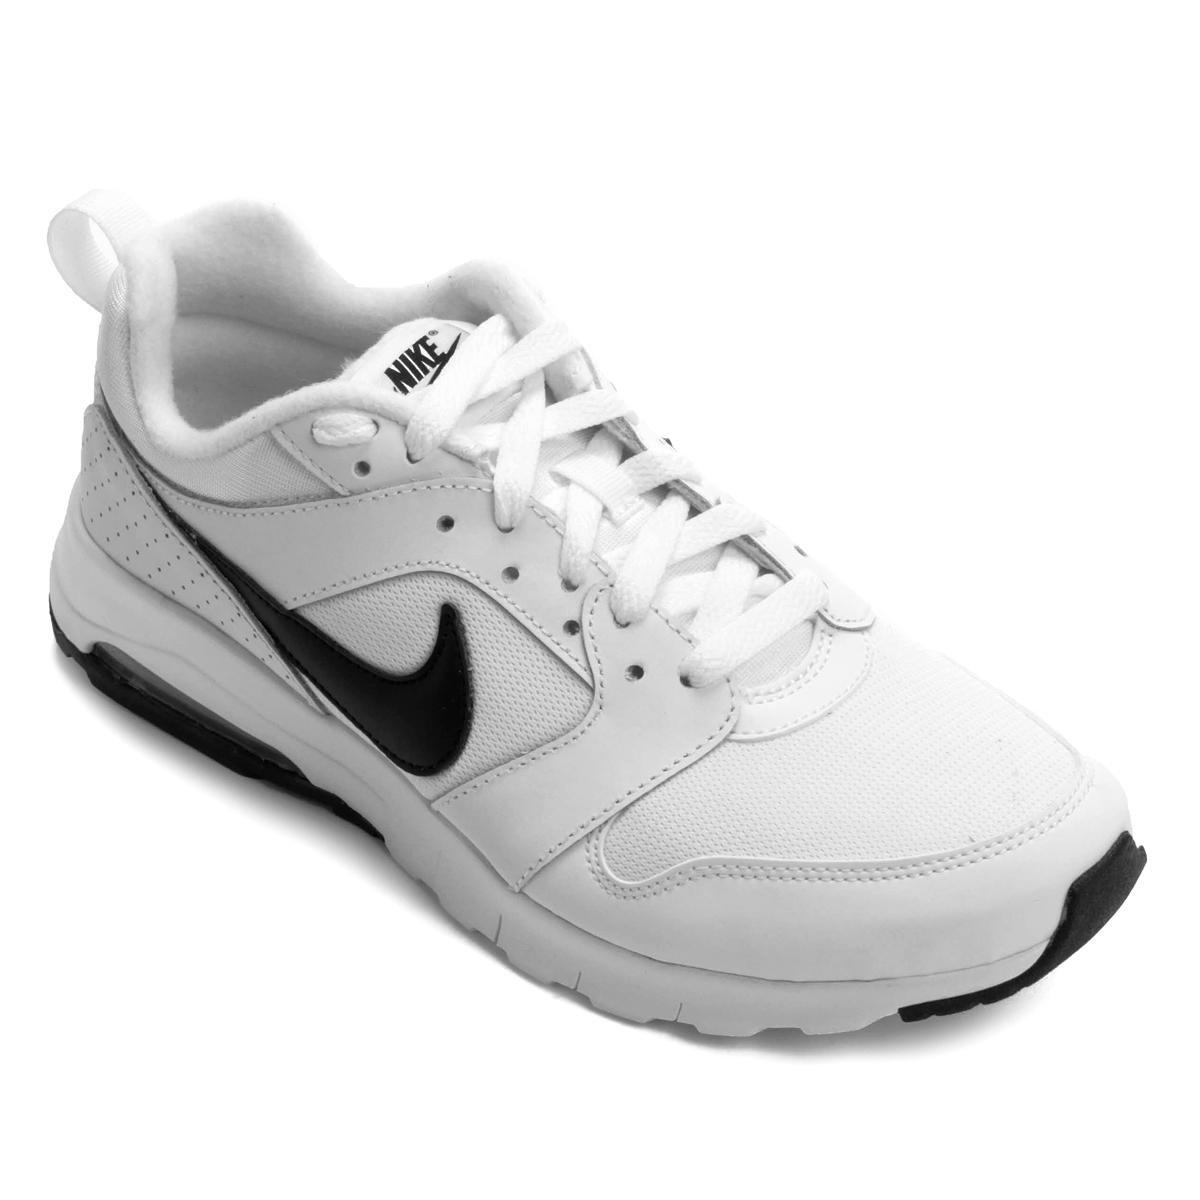 31ebbd7523f Tênis Nike Air Max Motion Masculino - Compre Agora